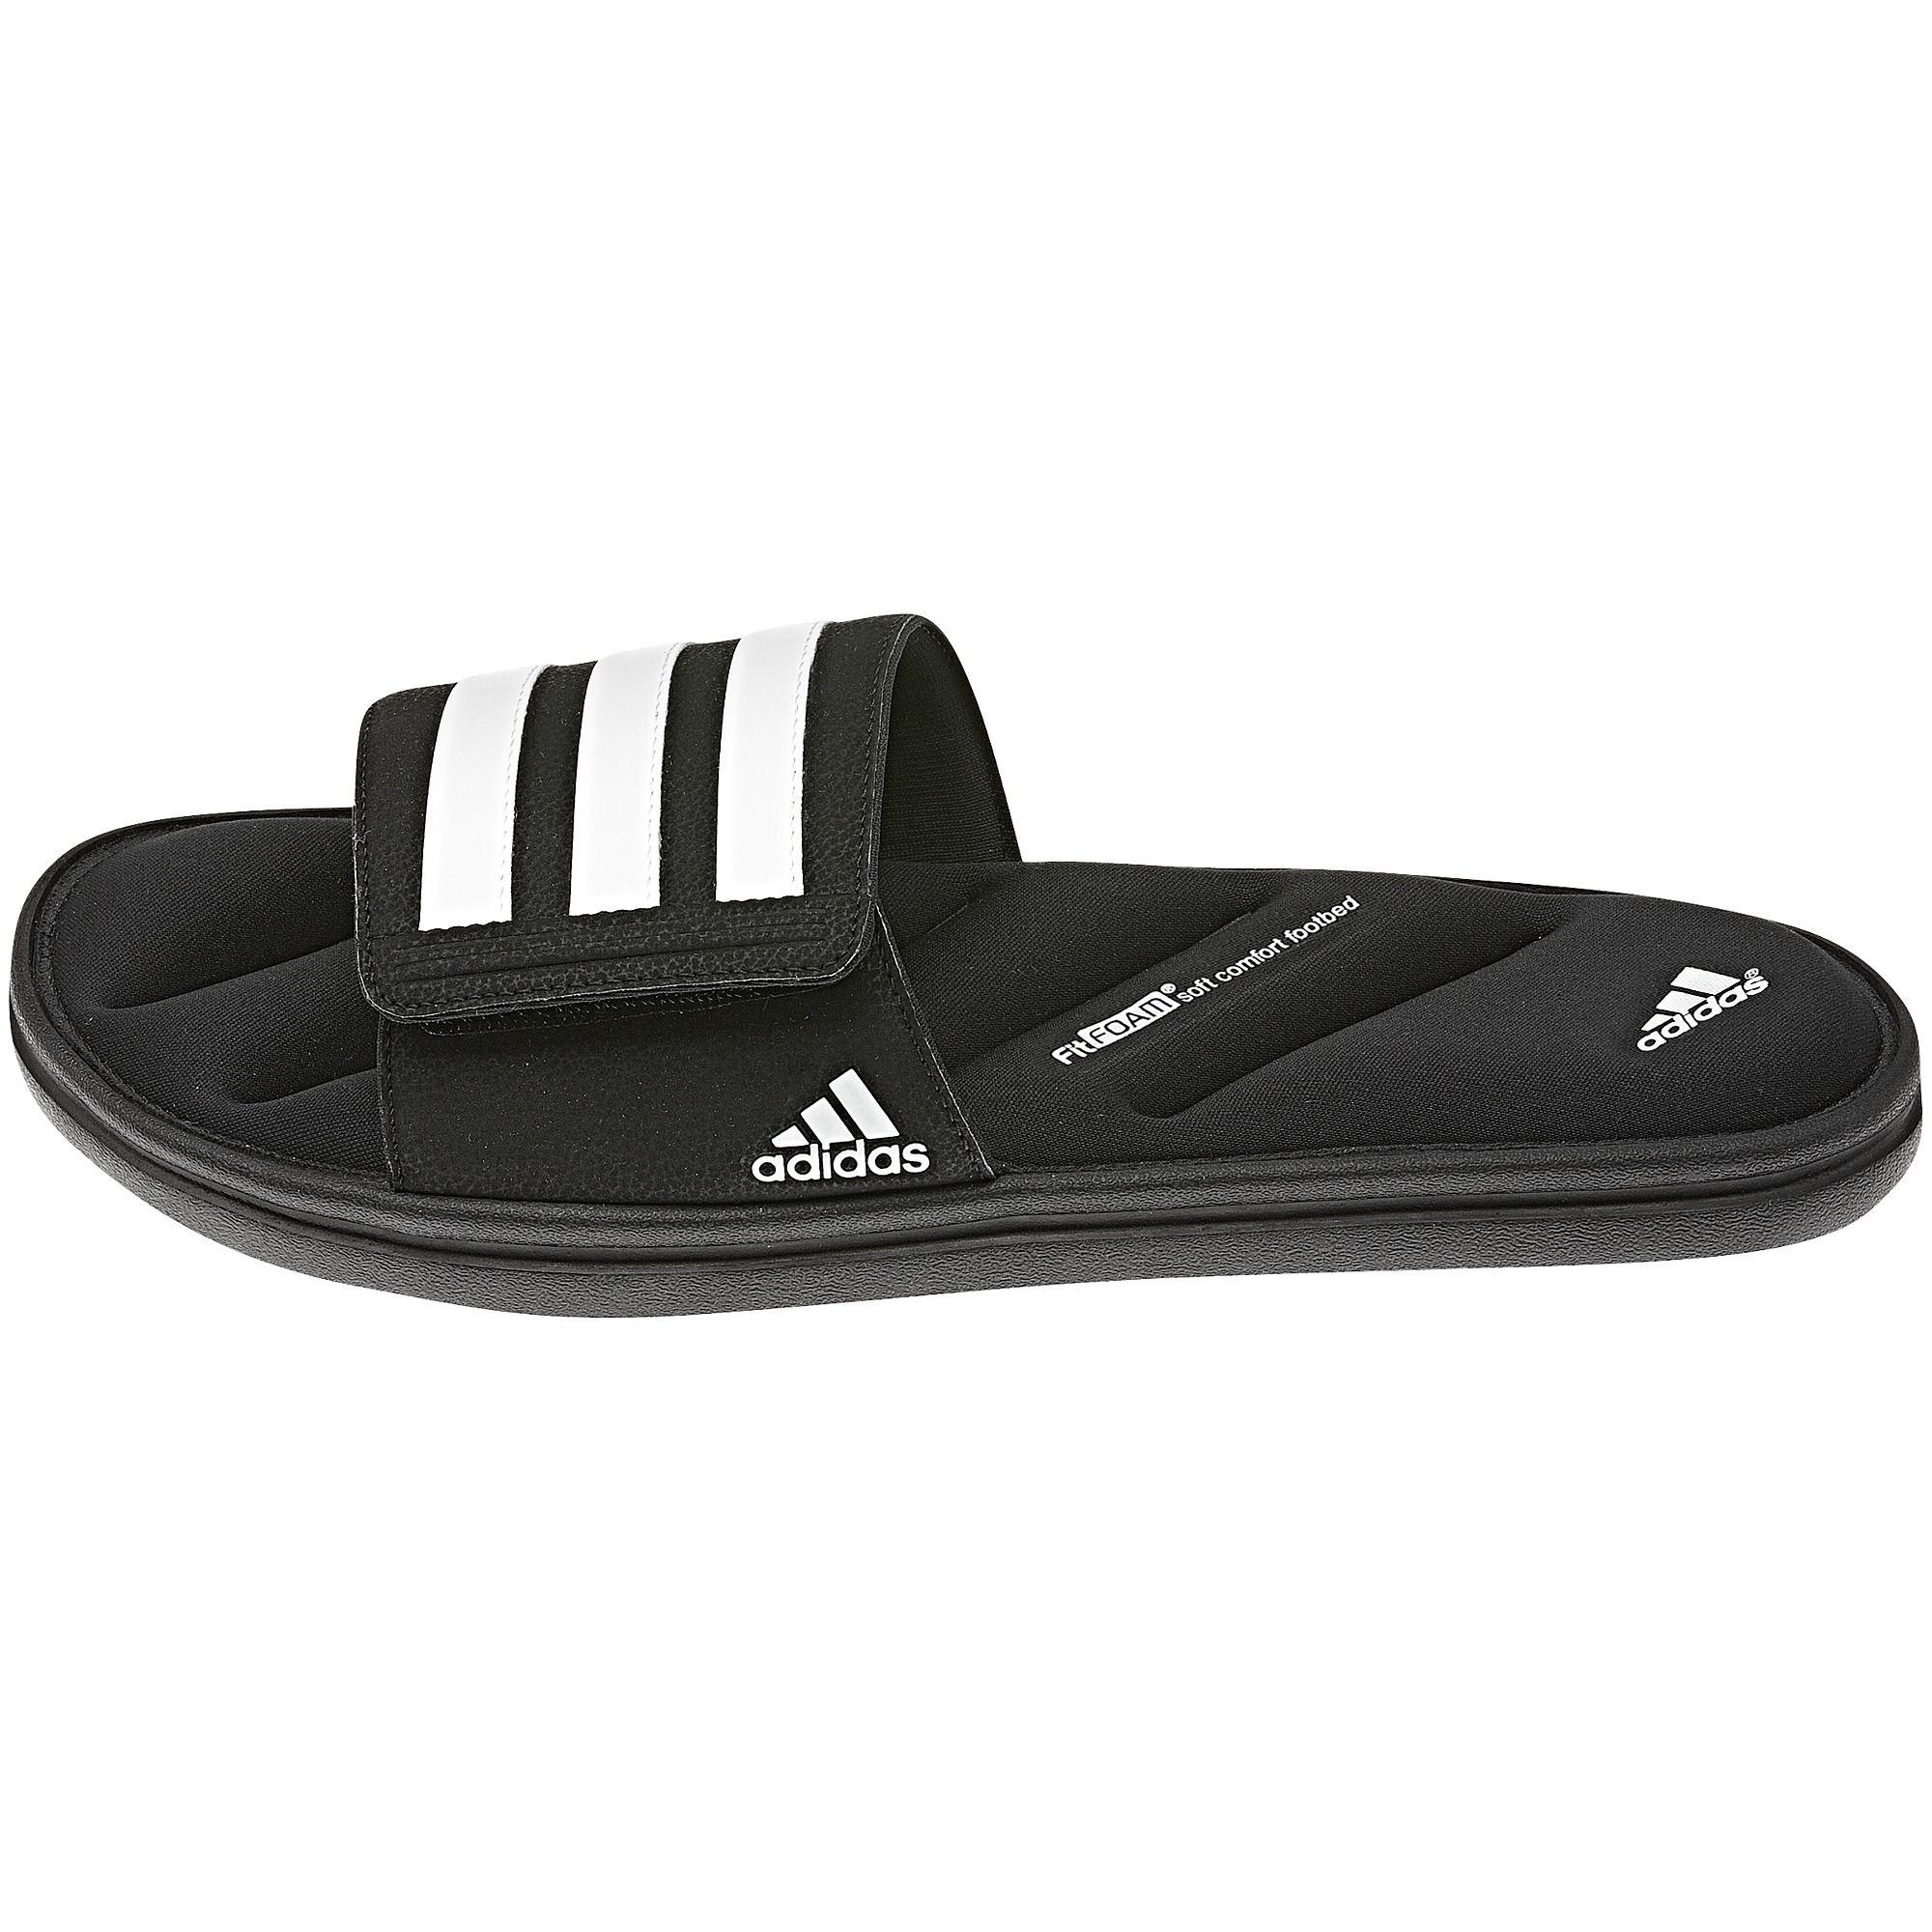 Us 8Footwear 8Footwear AdidasAdidas Men's Us CanadaSandals AdidasAdidas CanadaSandals Us Men's Men's rdQCsth